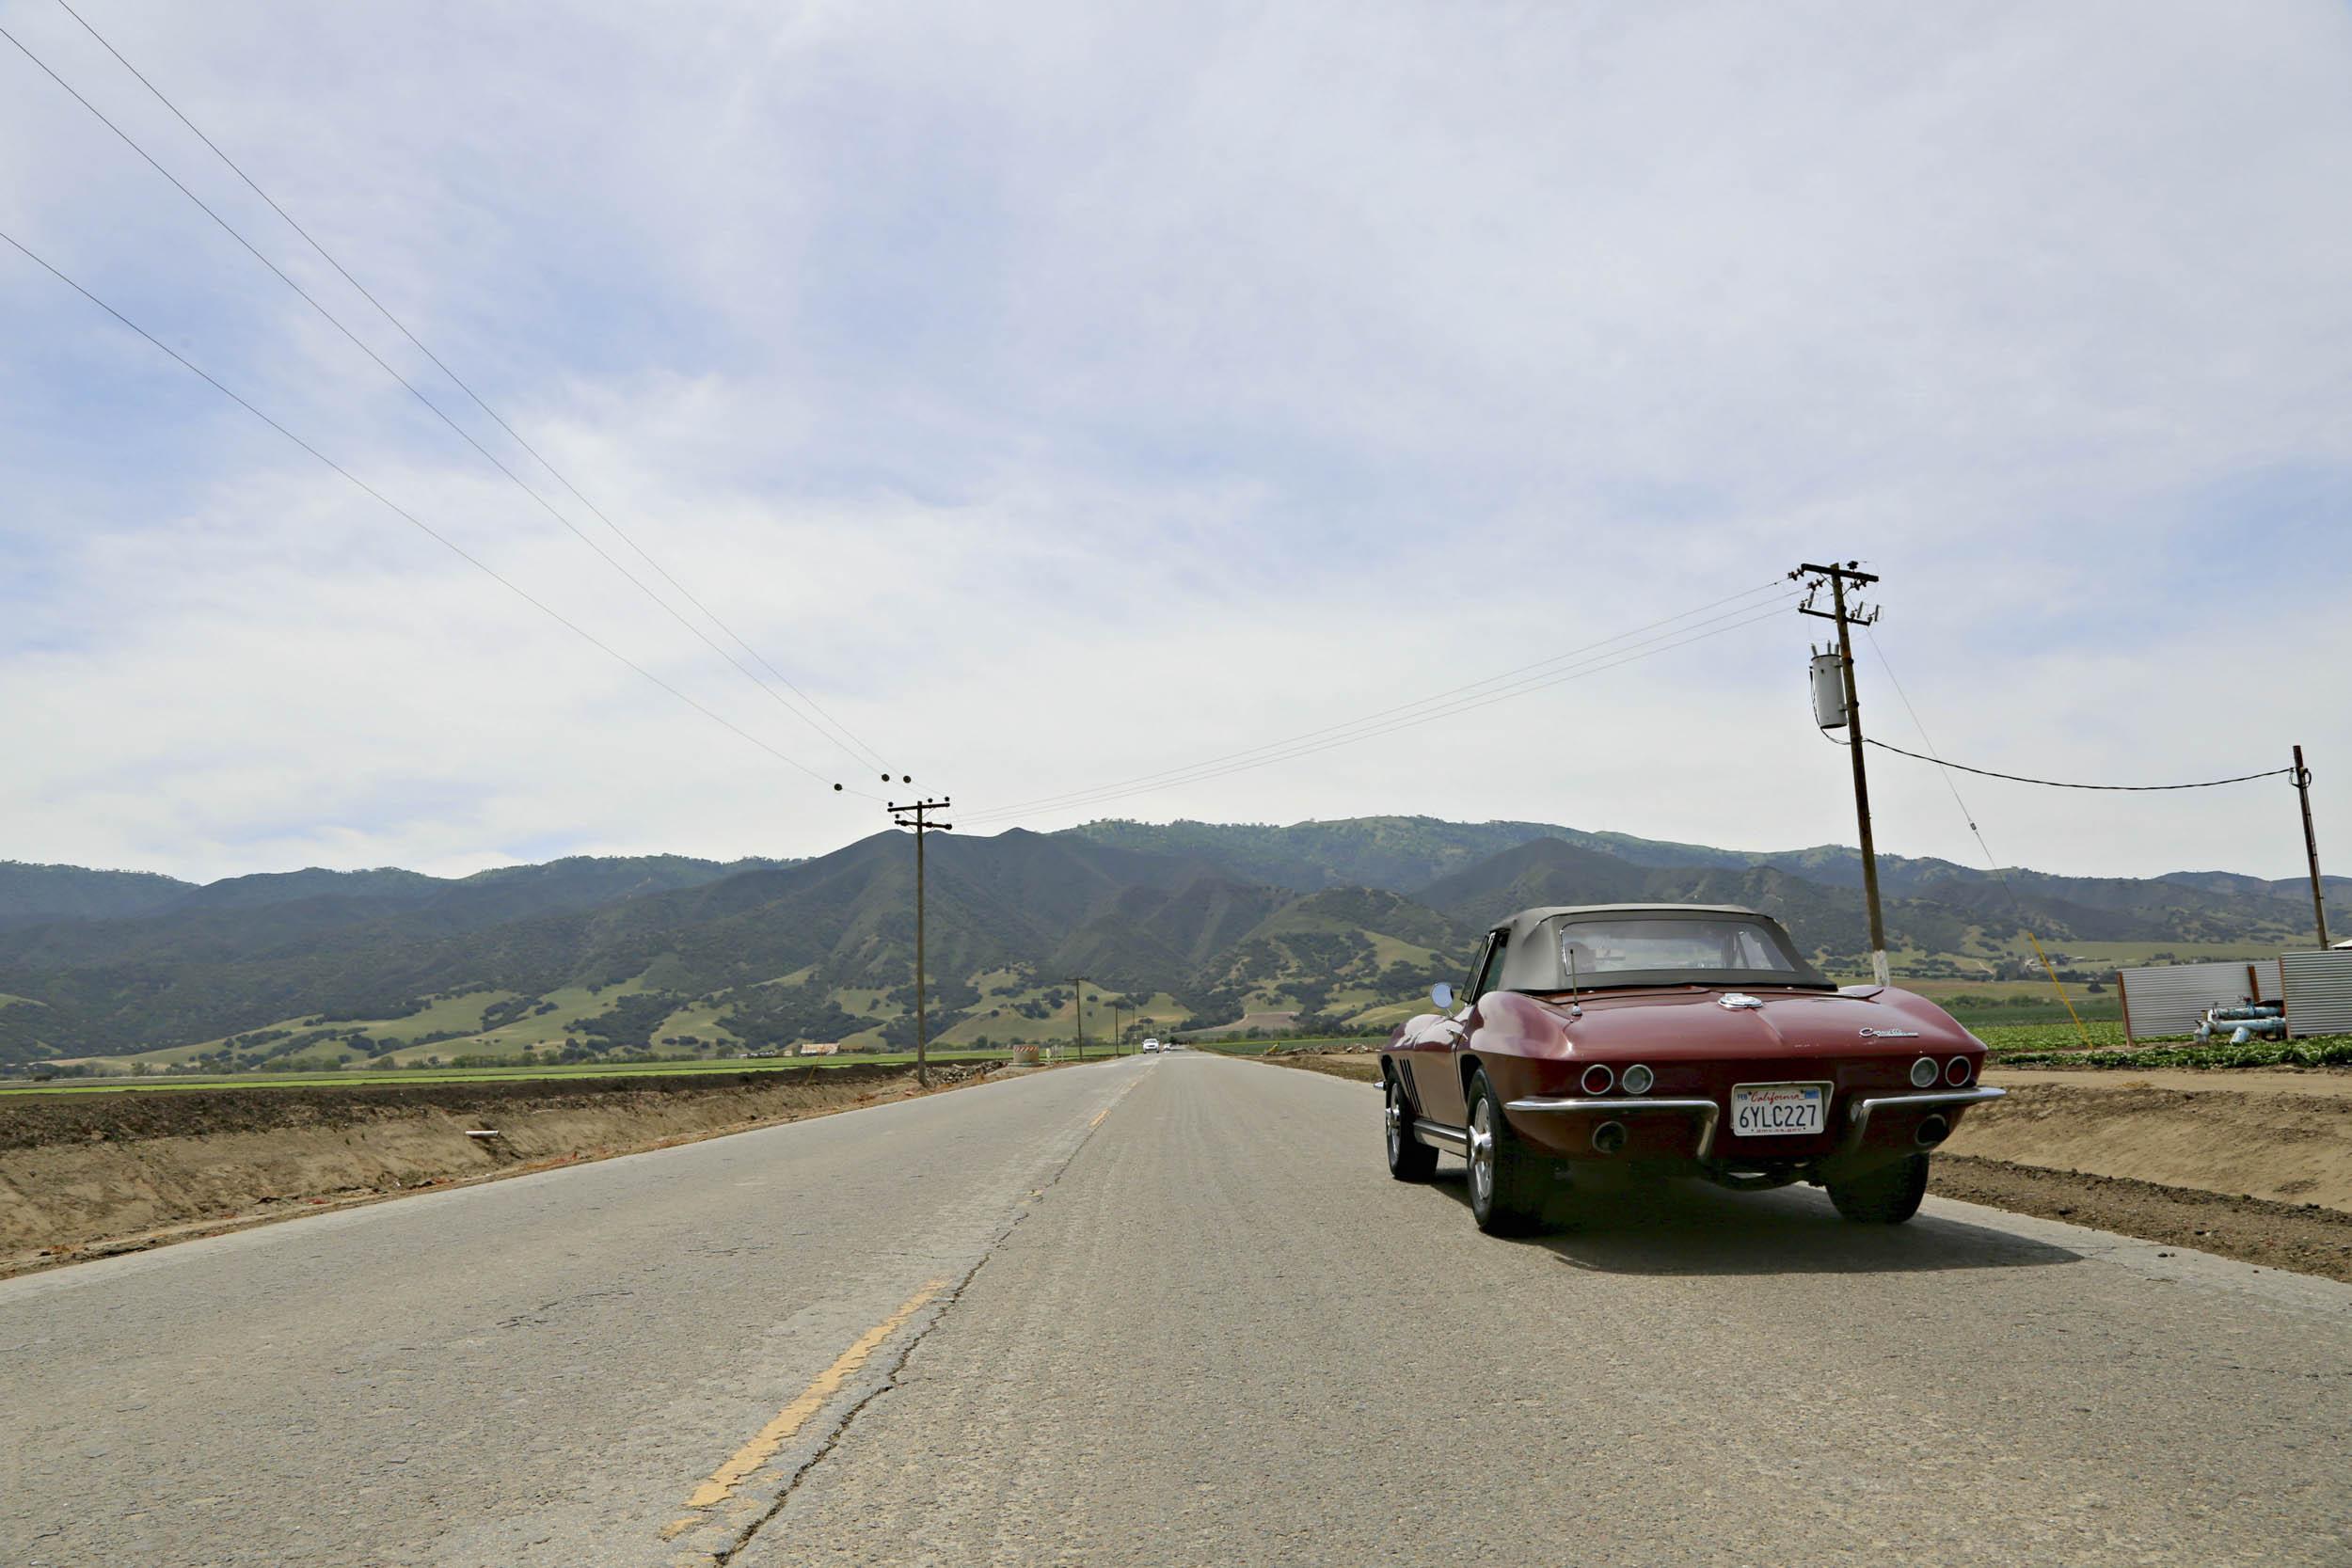 Corvette driving towards the mountains